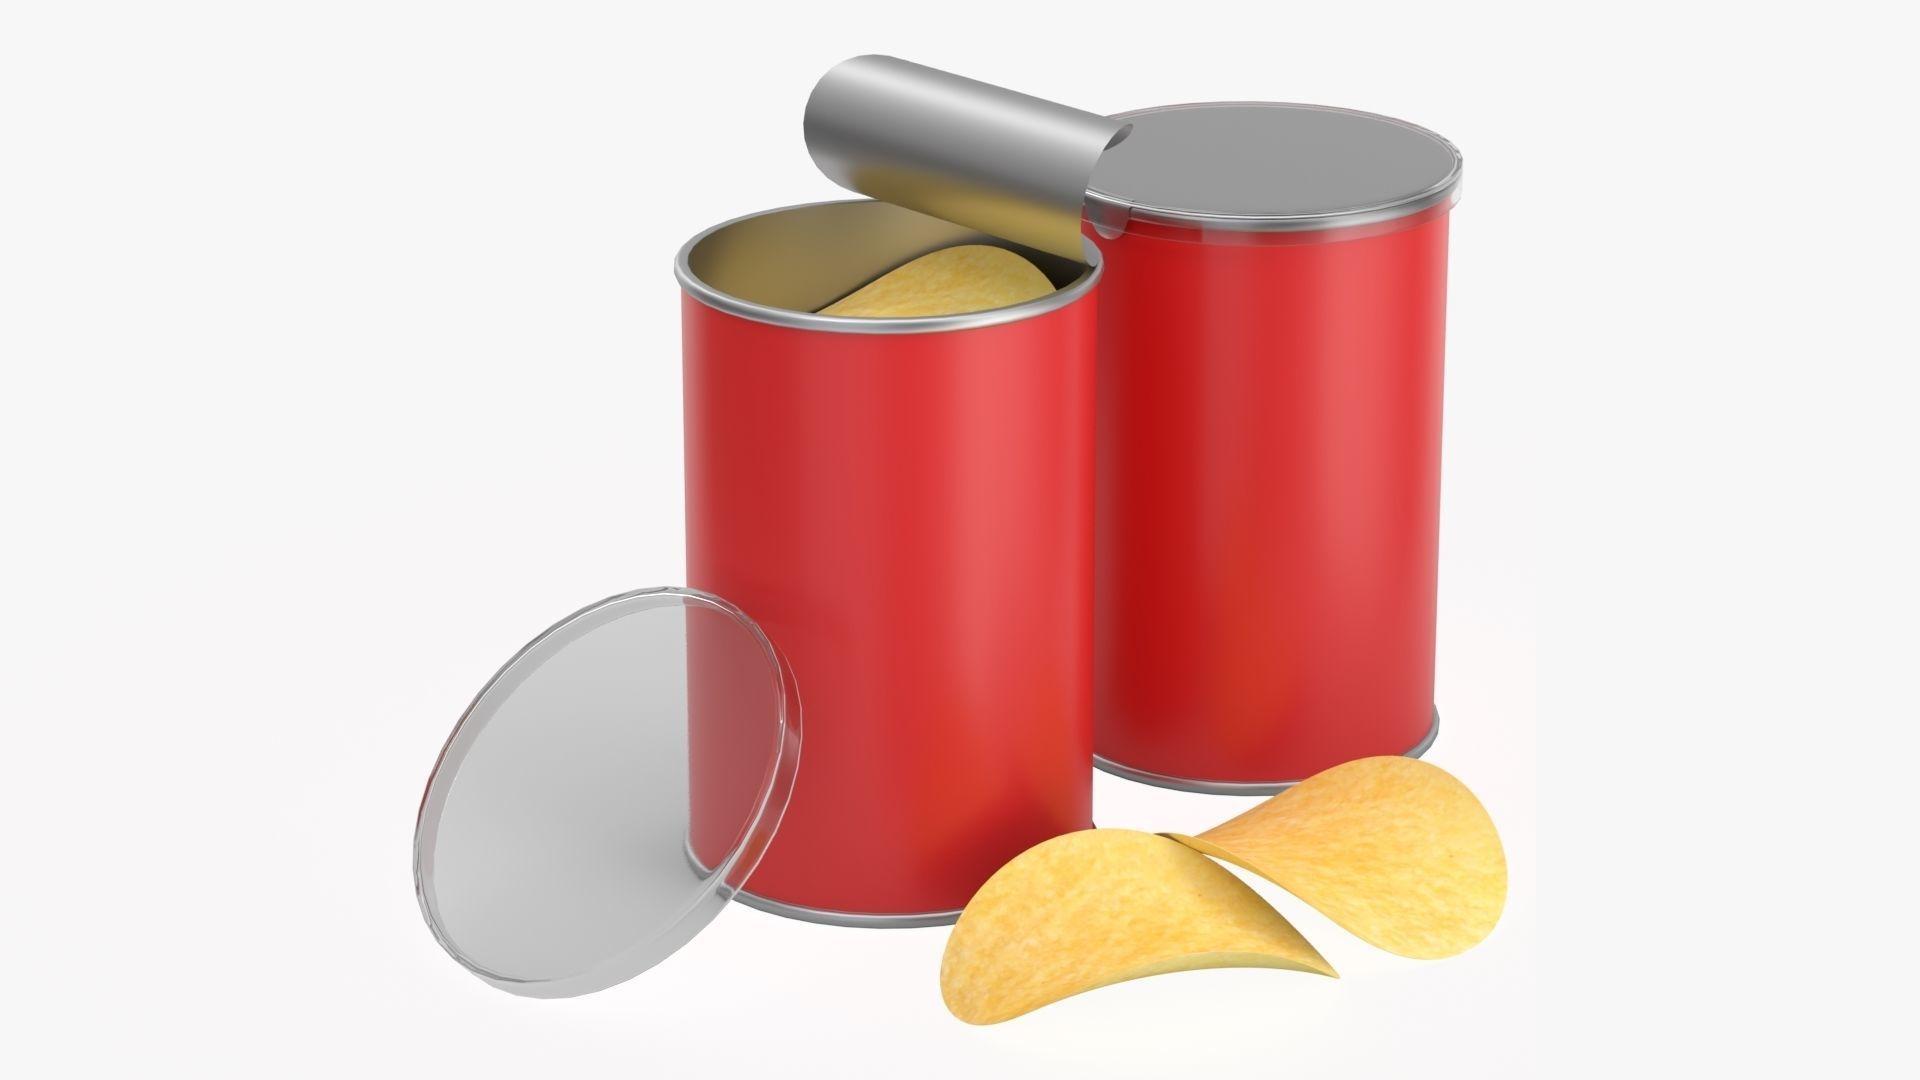 Carton tube packaging for potato chips